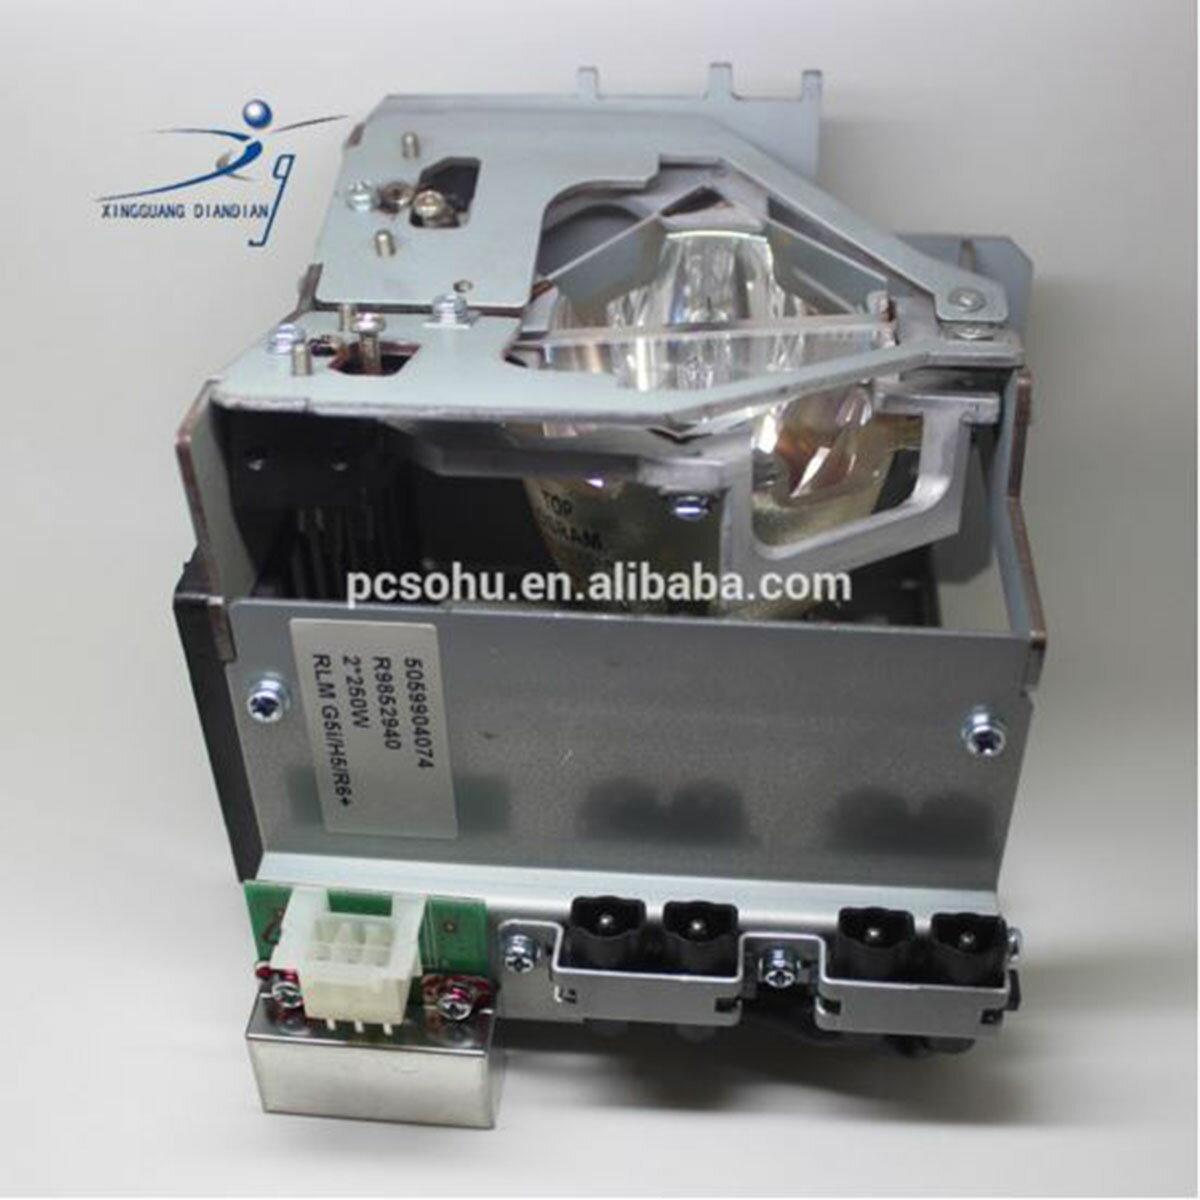 Lutema Platinum for Barco RLM G5 Projector Lamp Original Philips Bulb